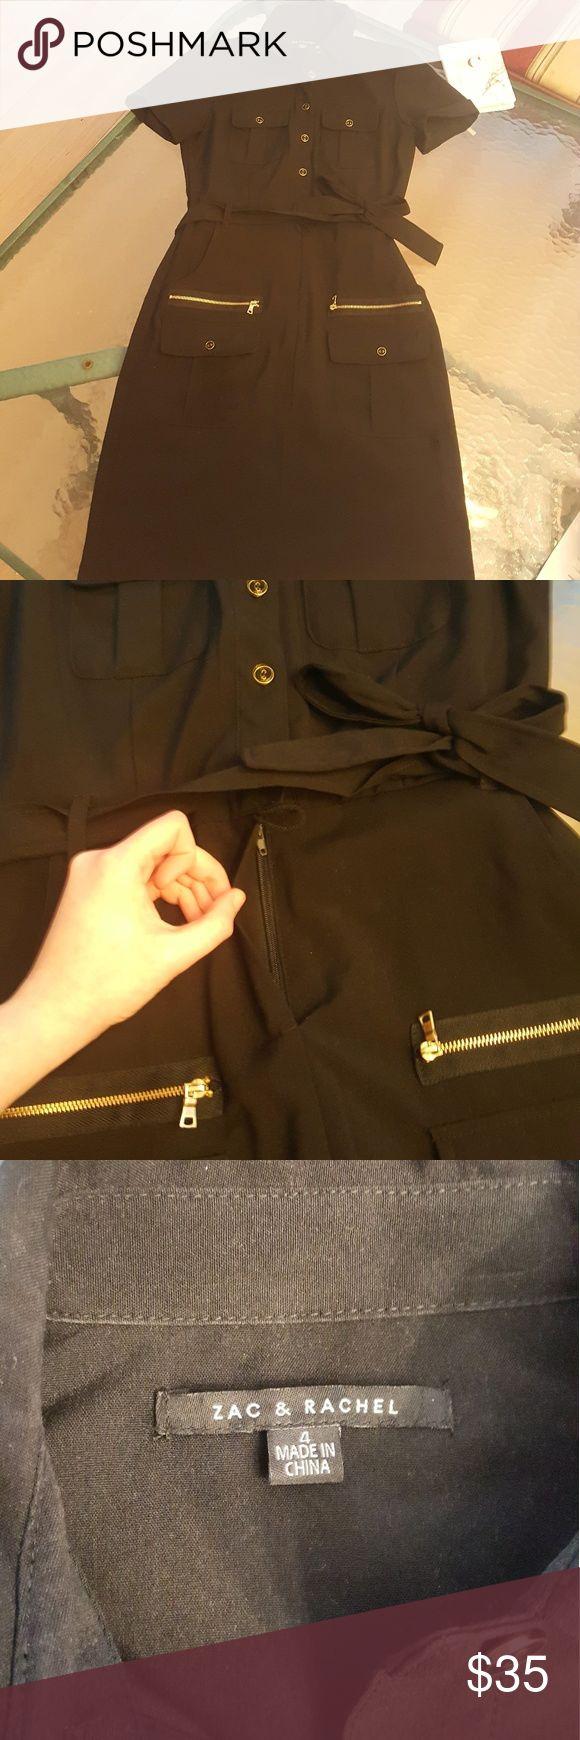 Zac & Rachel LBD Black & Gold Work Dress Like NEW Like New, Worn once, great conditon, black color, gold zippers for front pockets, midi dress Zac & Rachel Dresses Midi